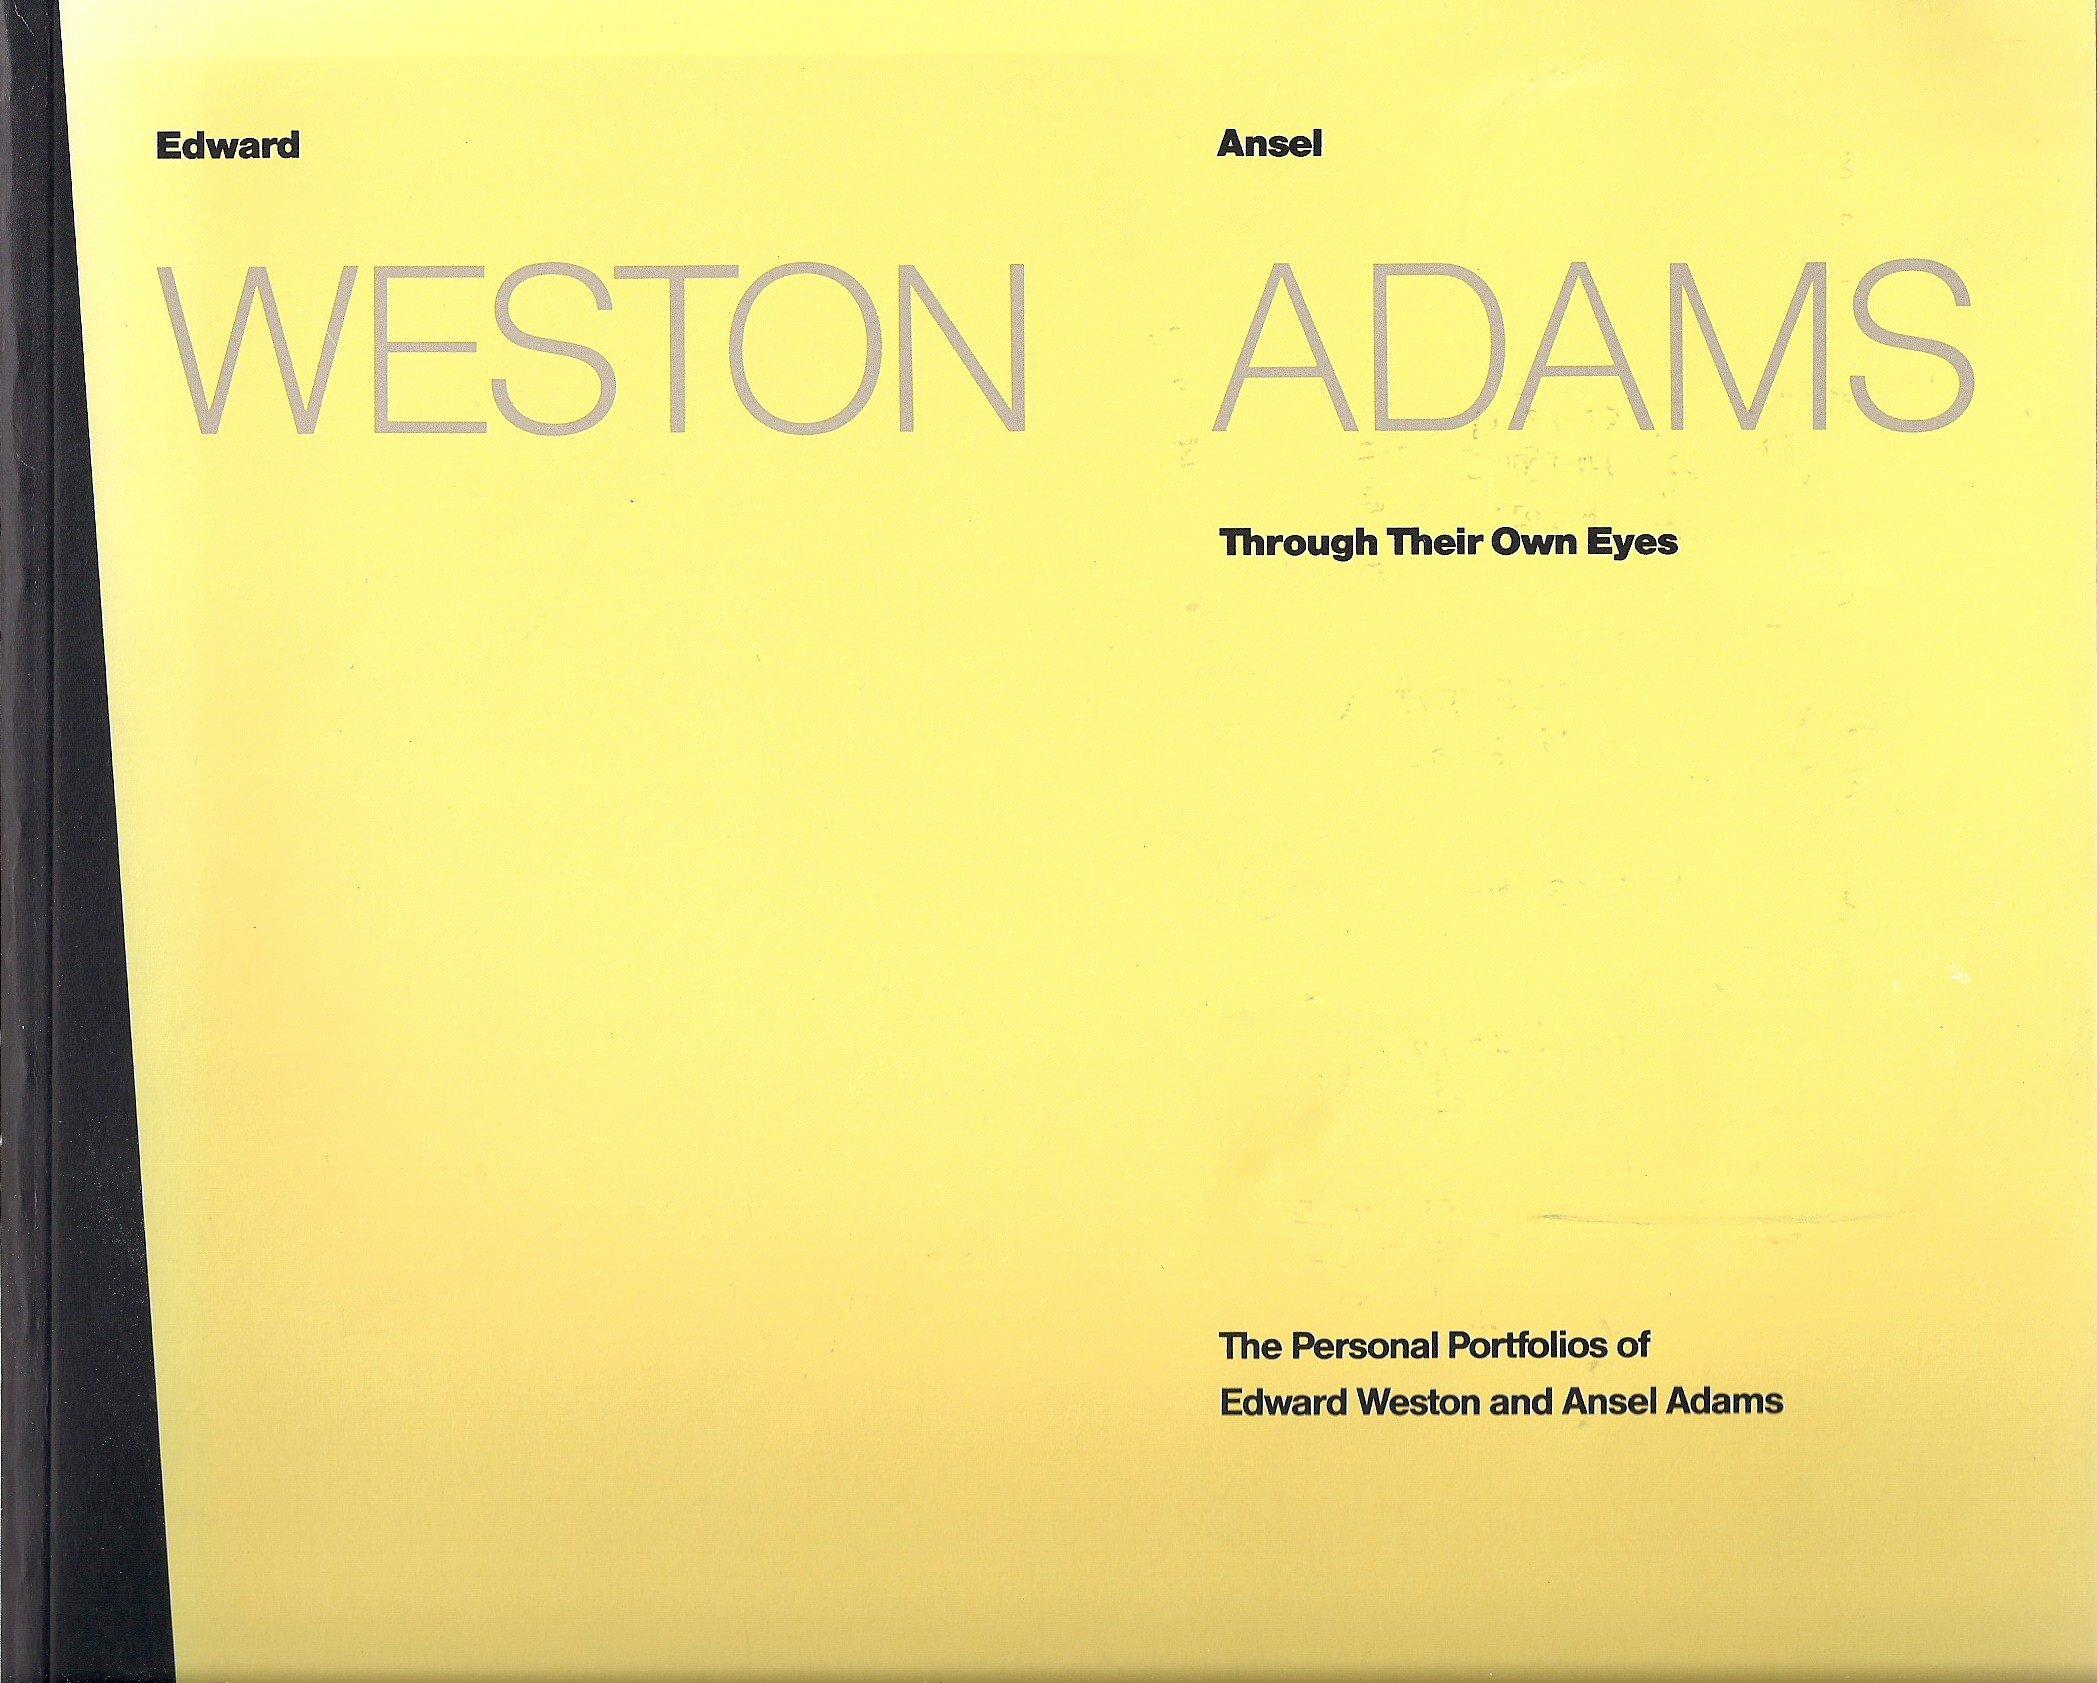 The Personal Portfolios of Edward Weston and Ansel Adams Through Their Own Eyes